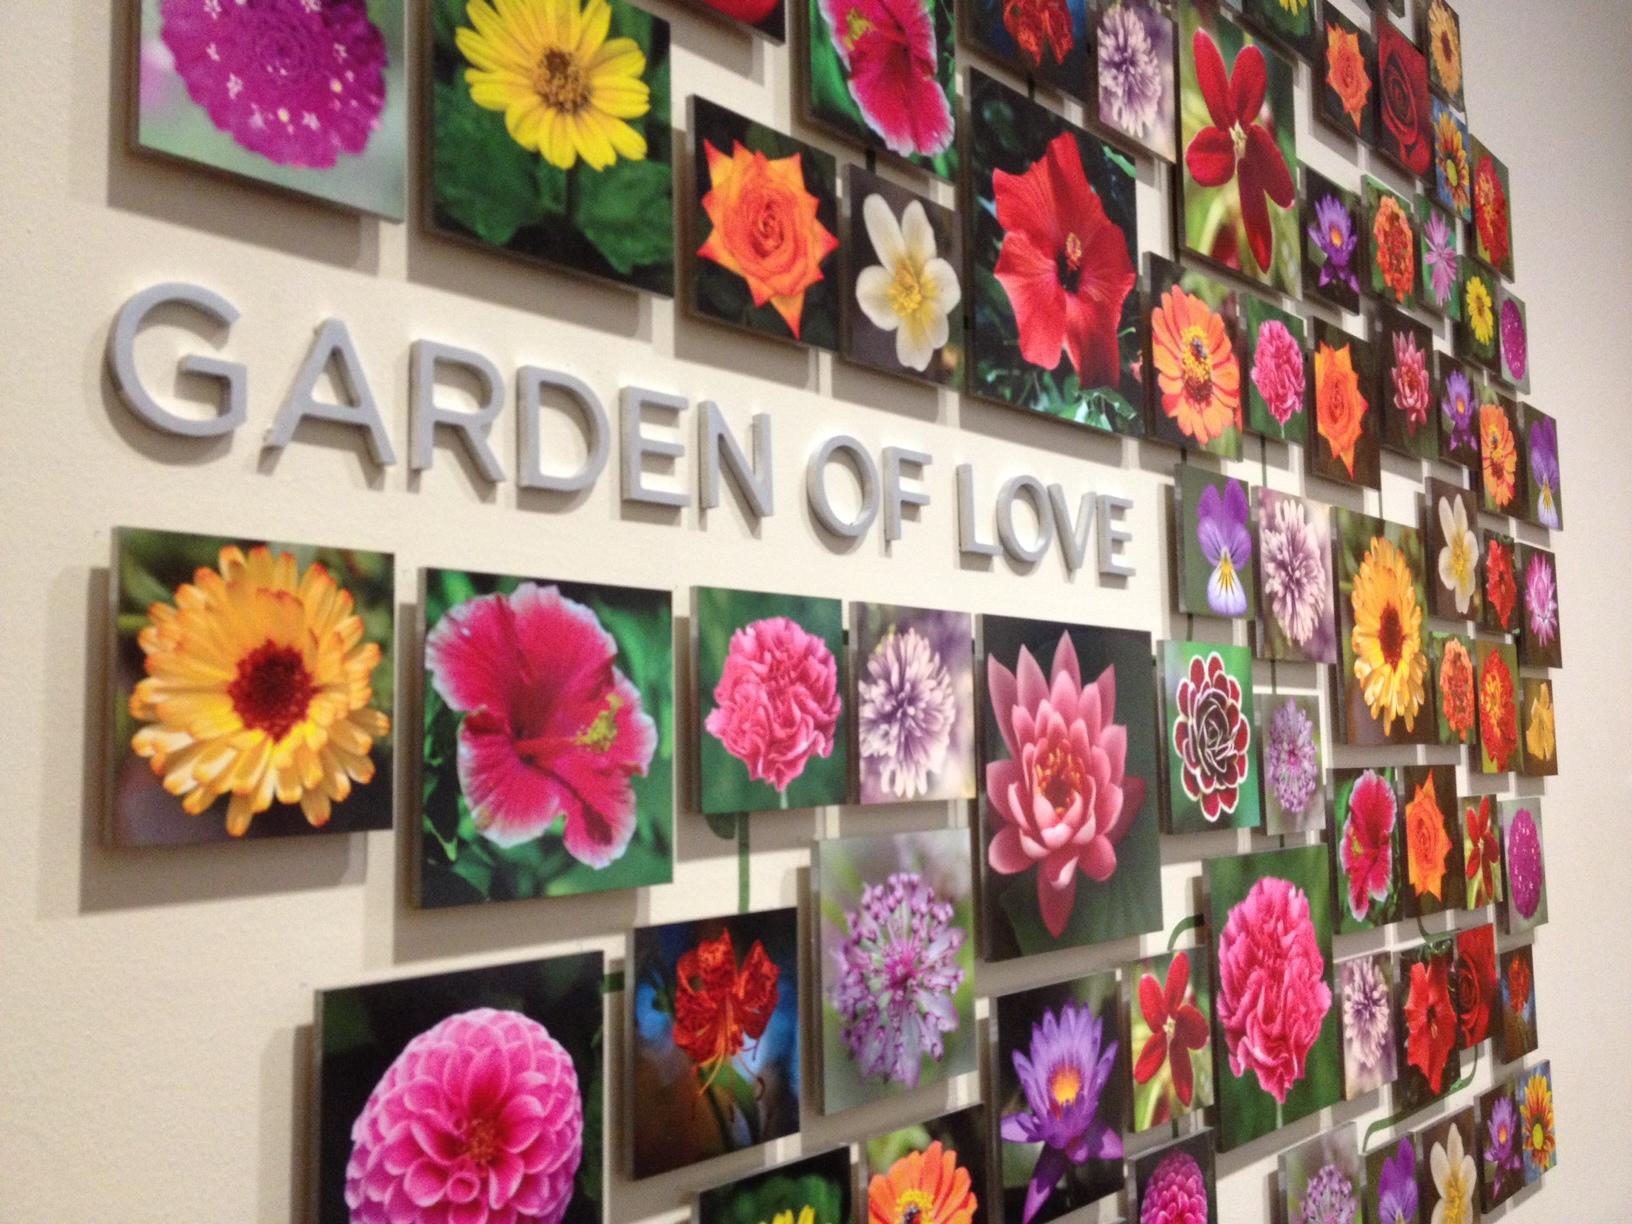 Garden of Love Sign